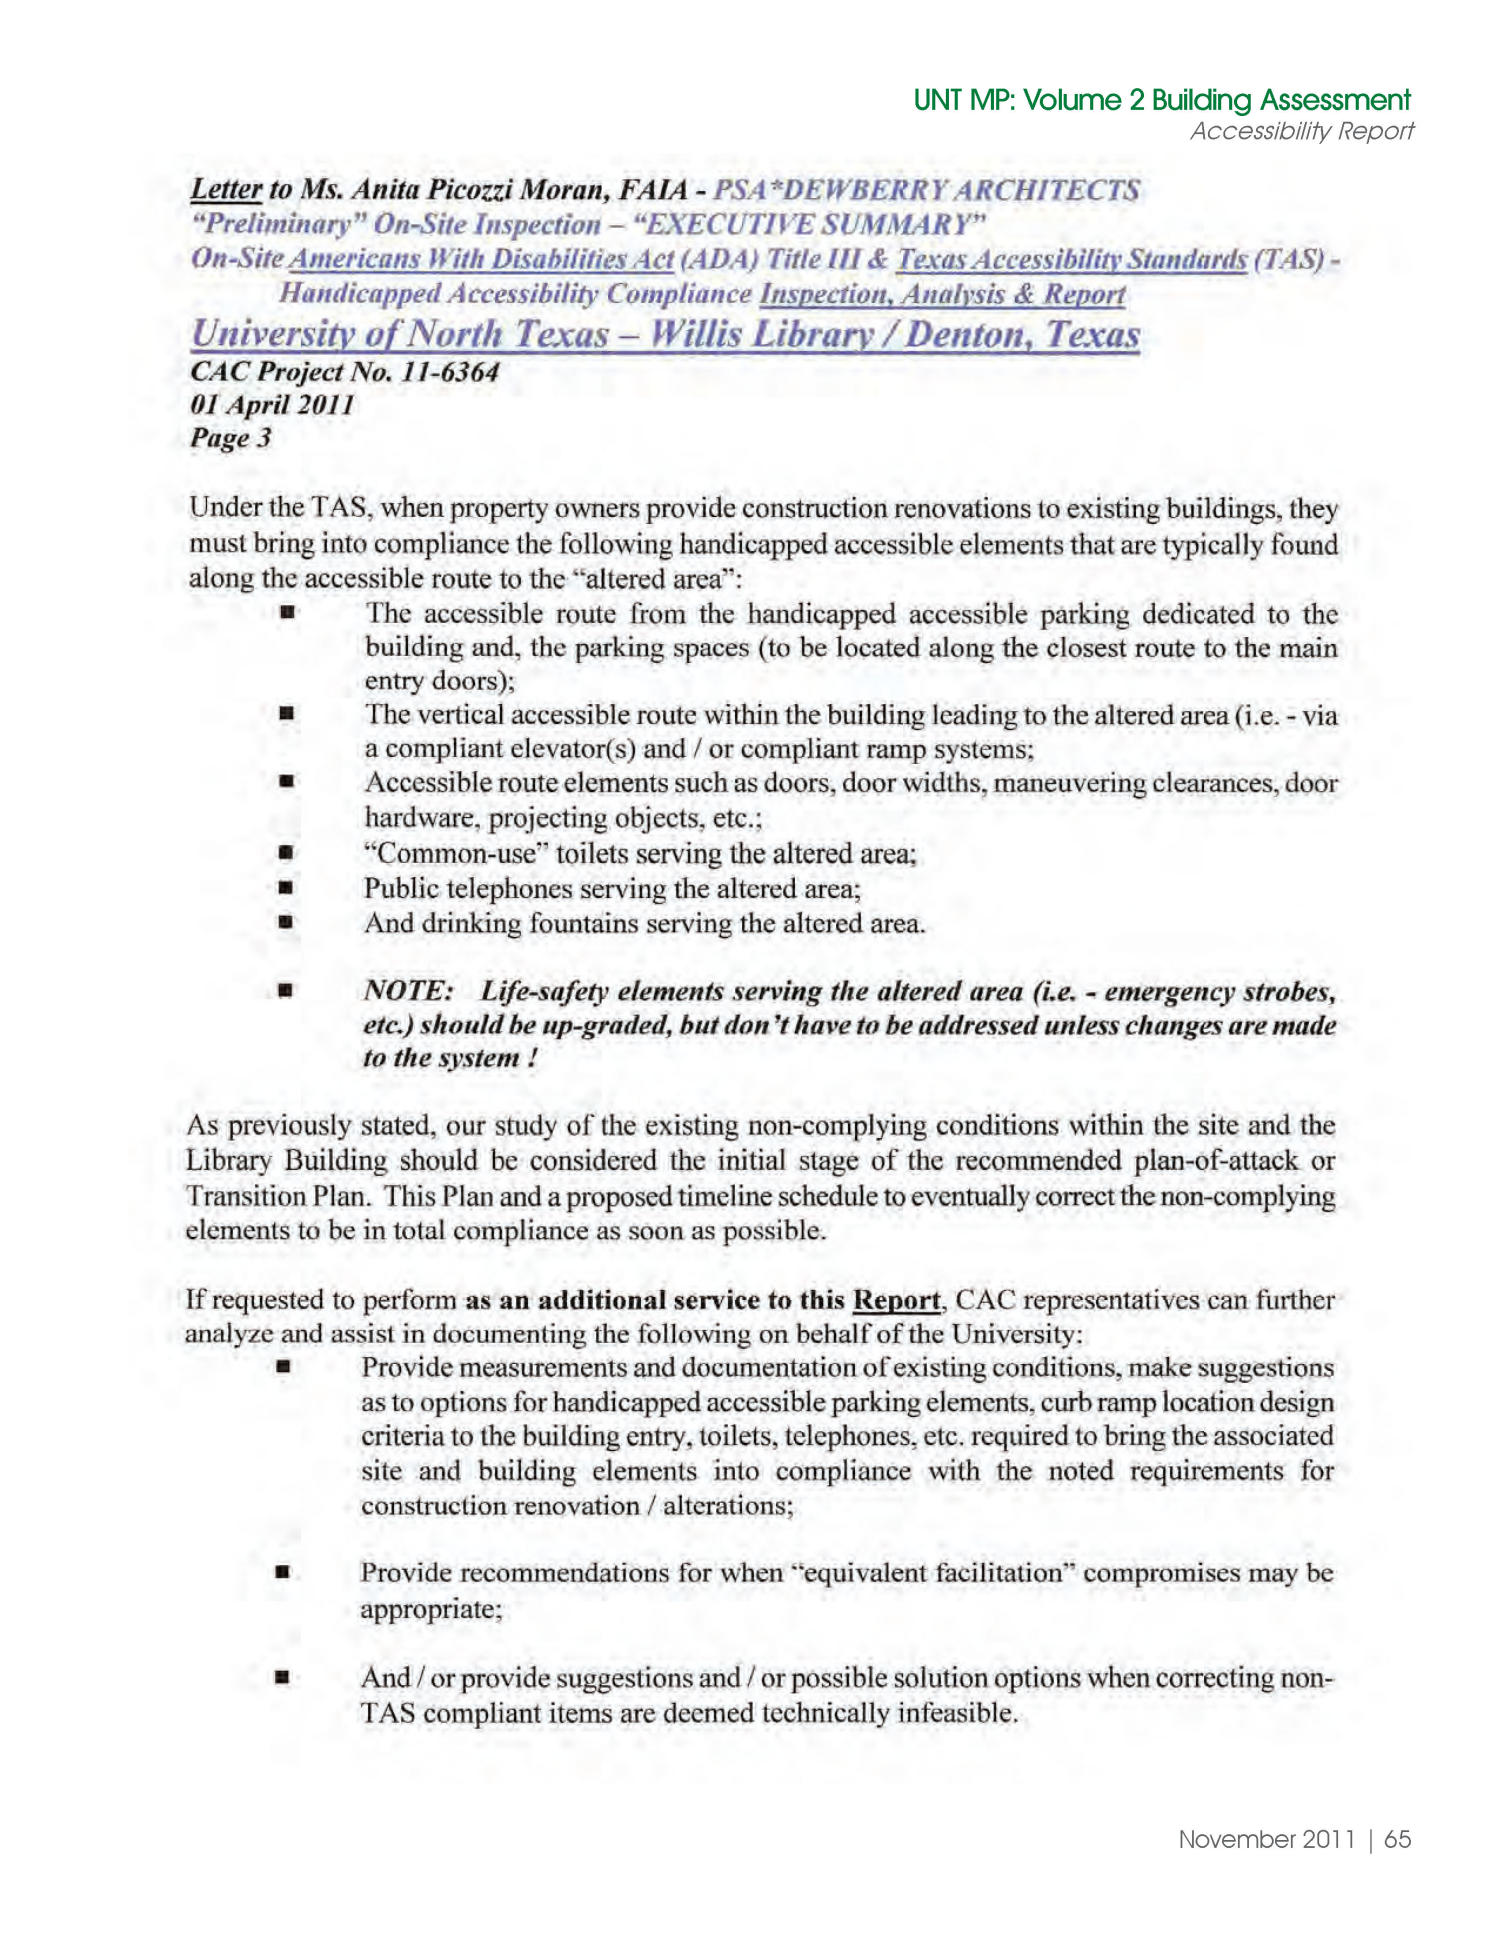 University of North Texas Libraries Master Plan, Volume 2